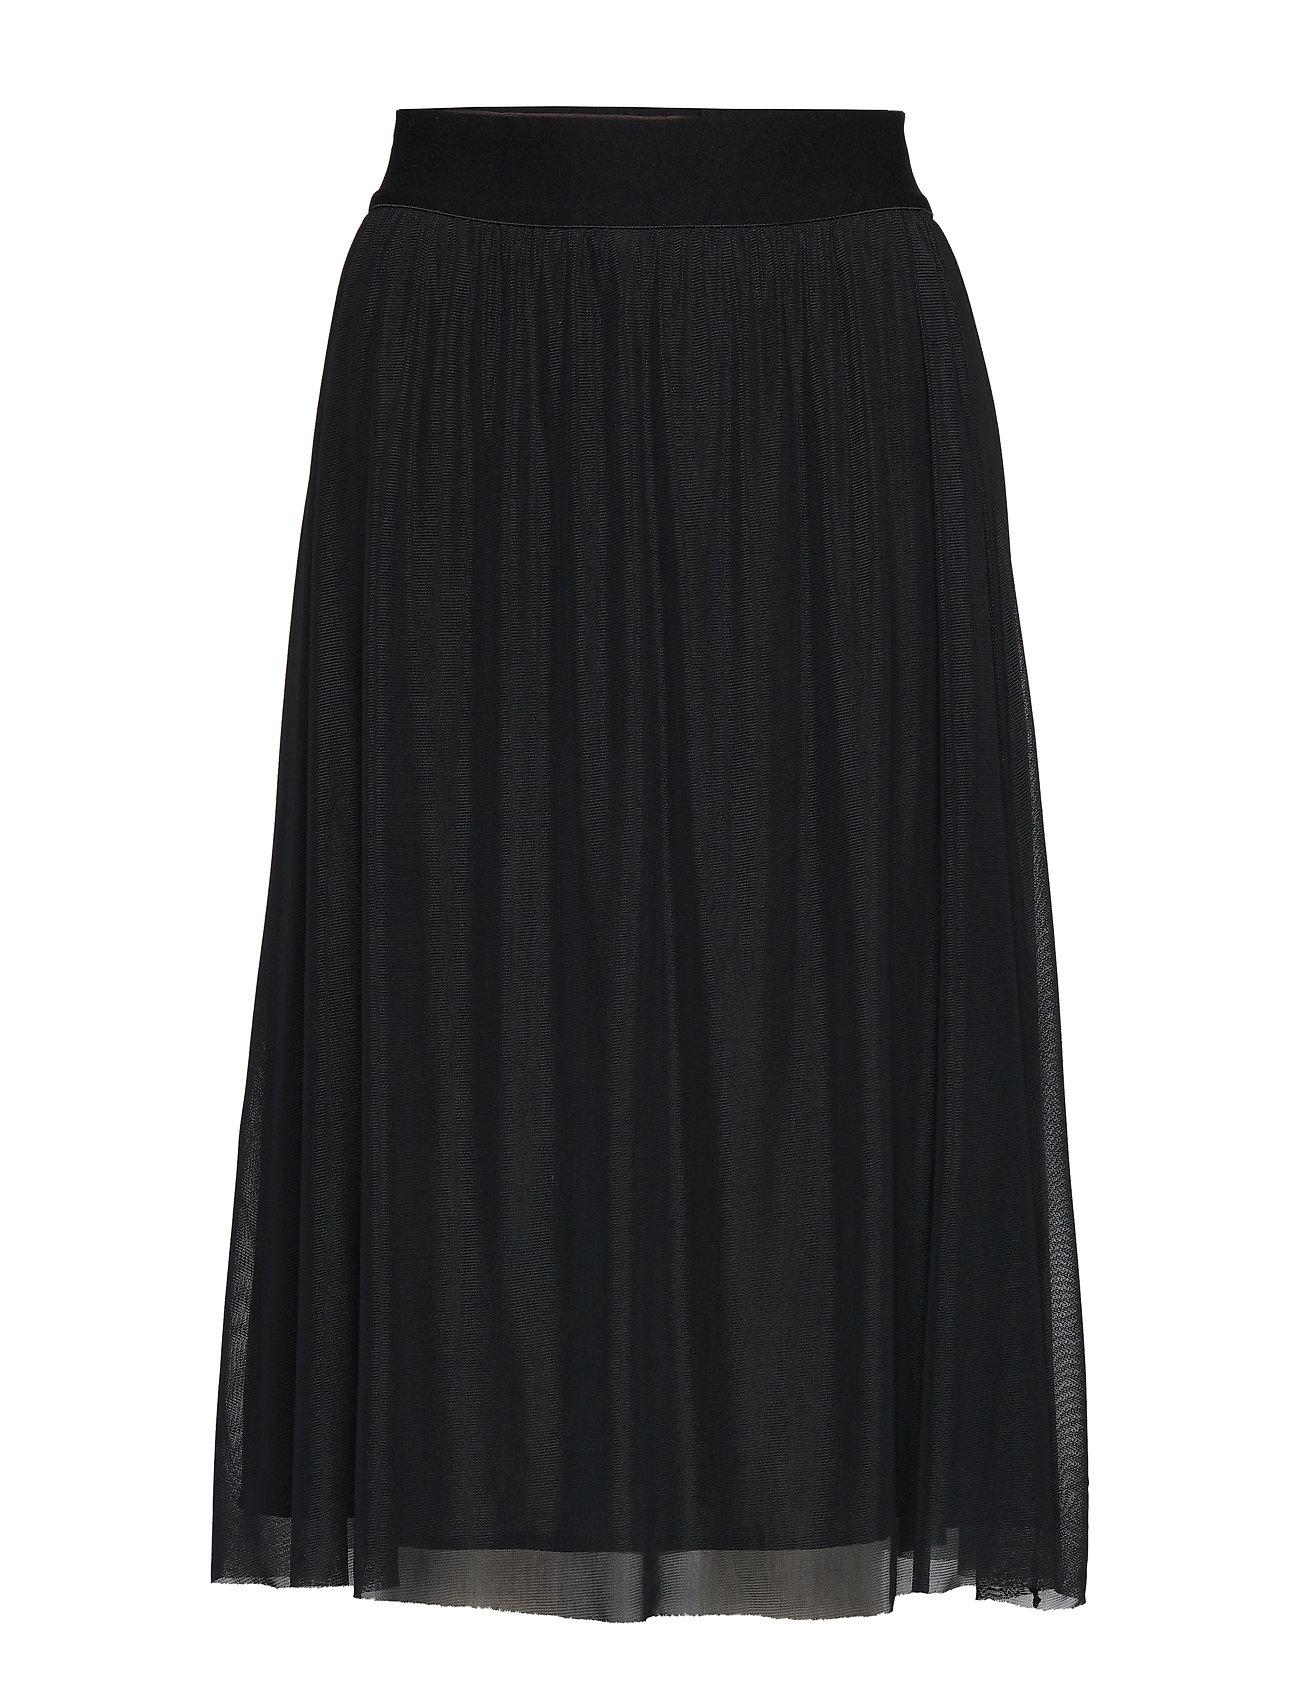 Bruuns Bazaar Thora Violet Skirt - BLACK